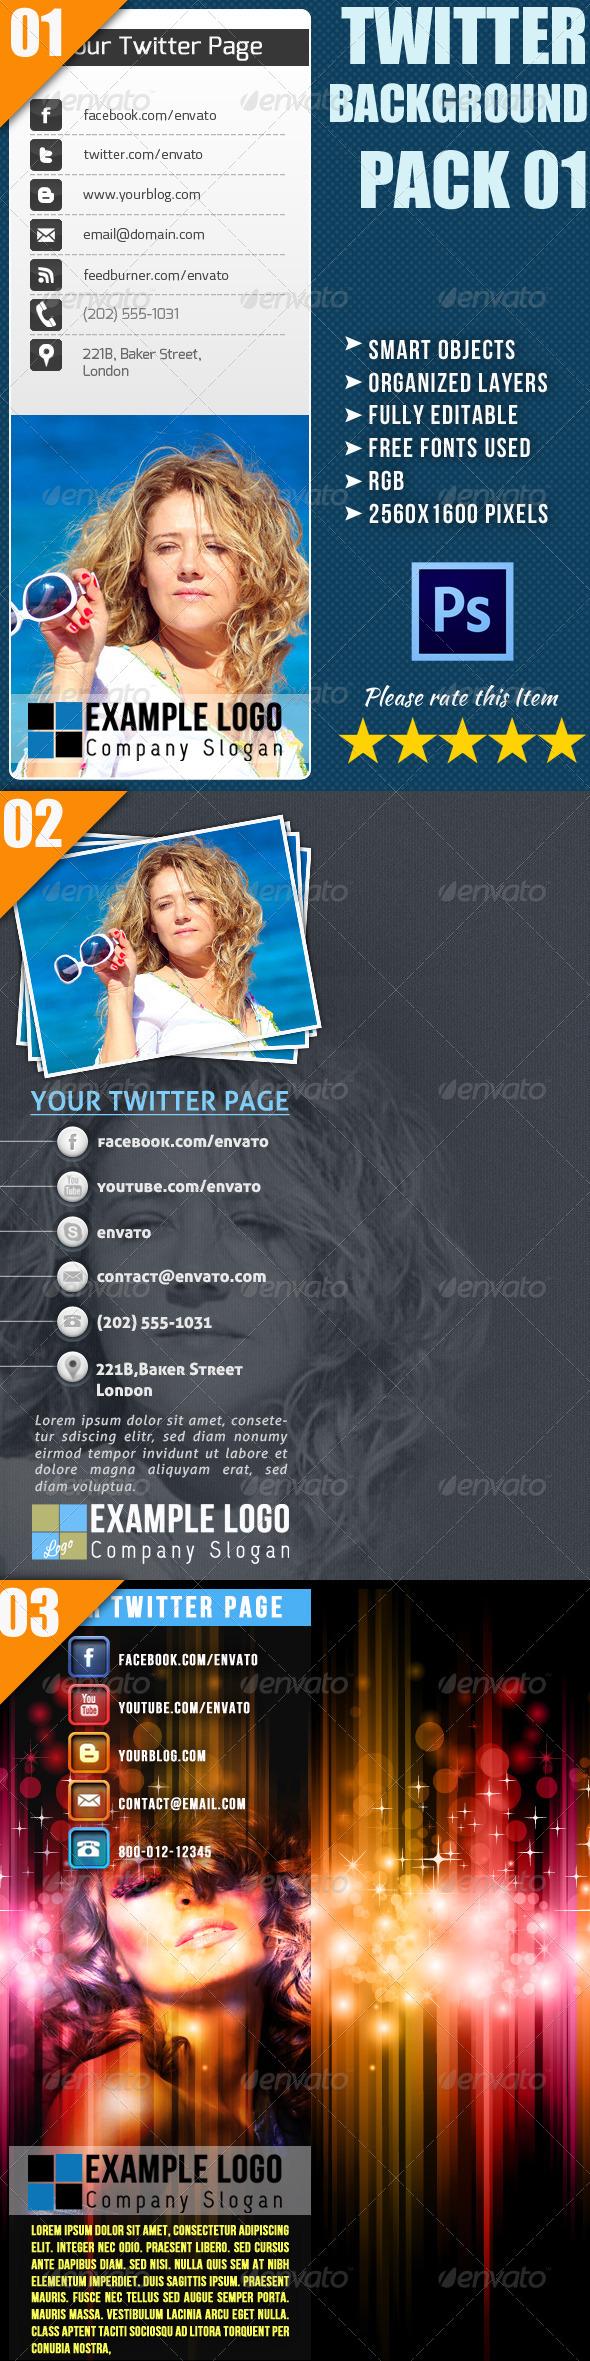 Twitter Background Bundle - Twitter Social Media